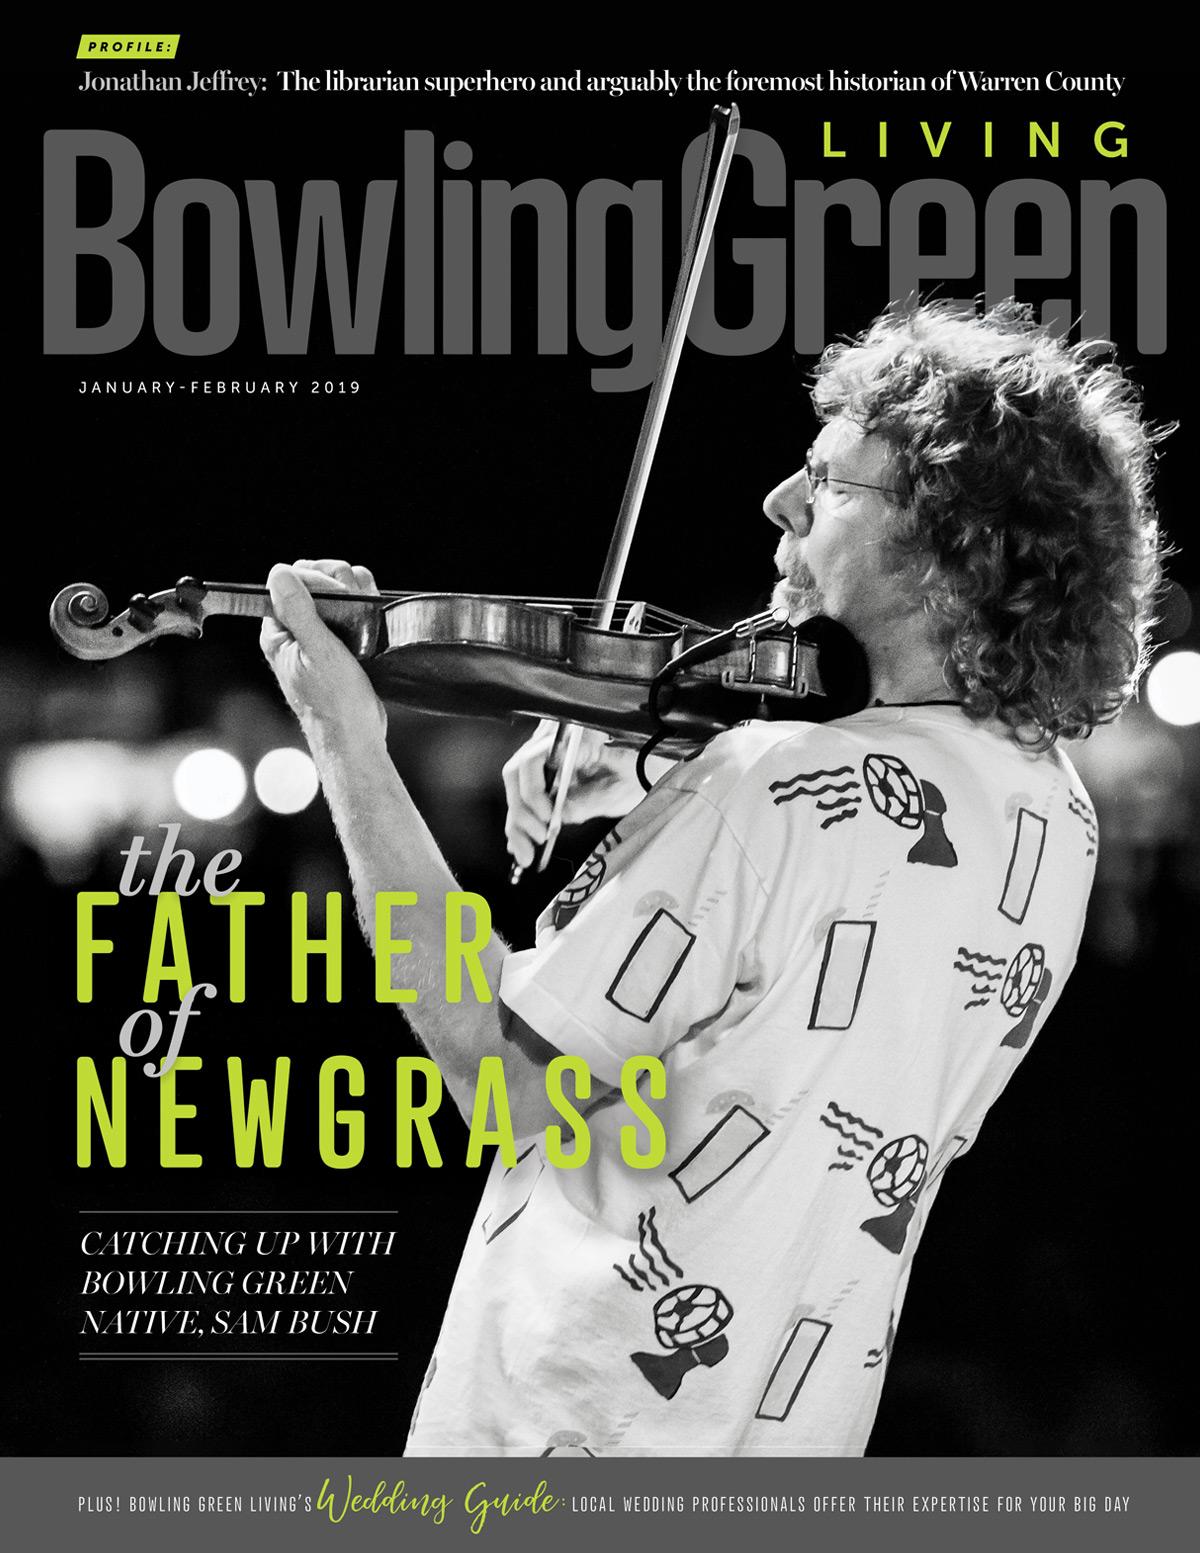 Jan/Feb 2019 Bowling Green Living Cover